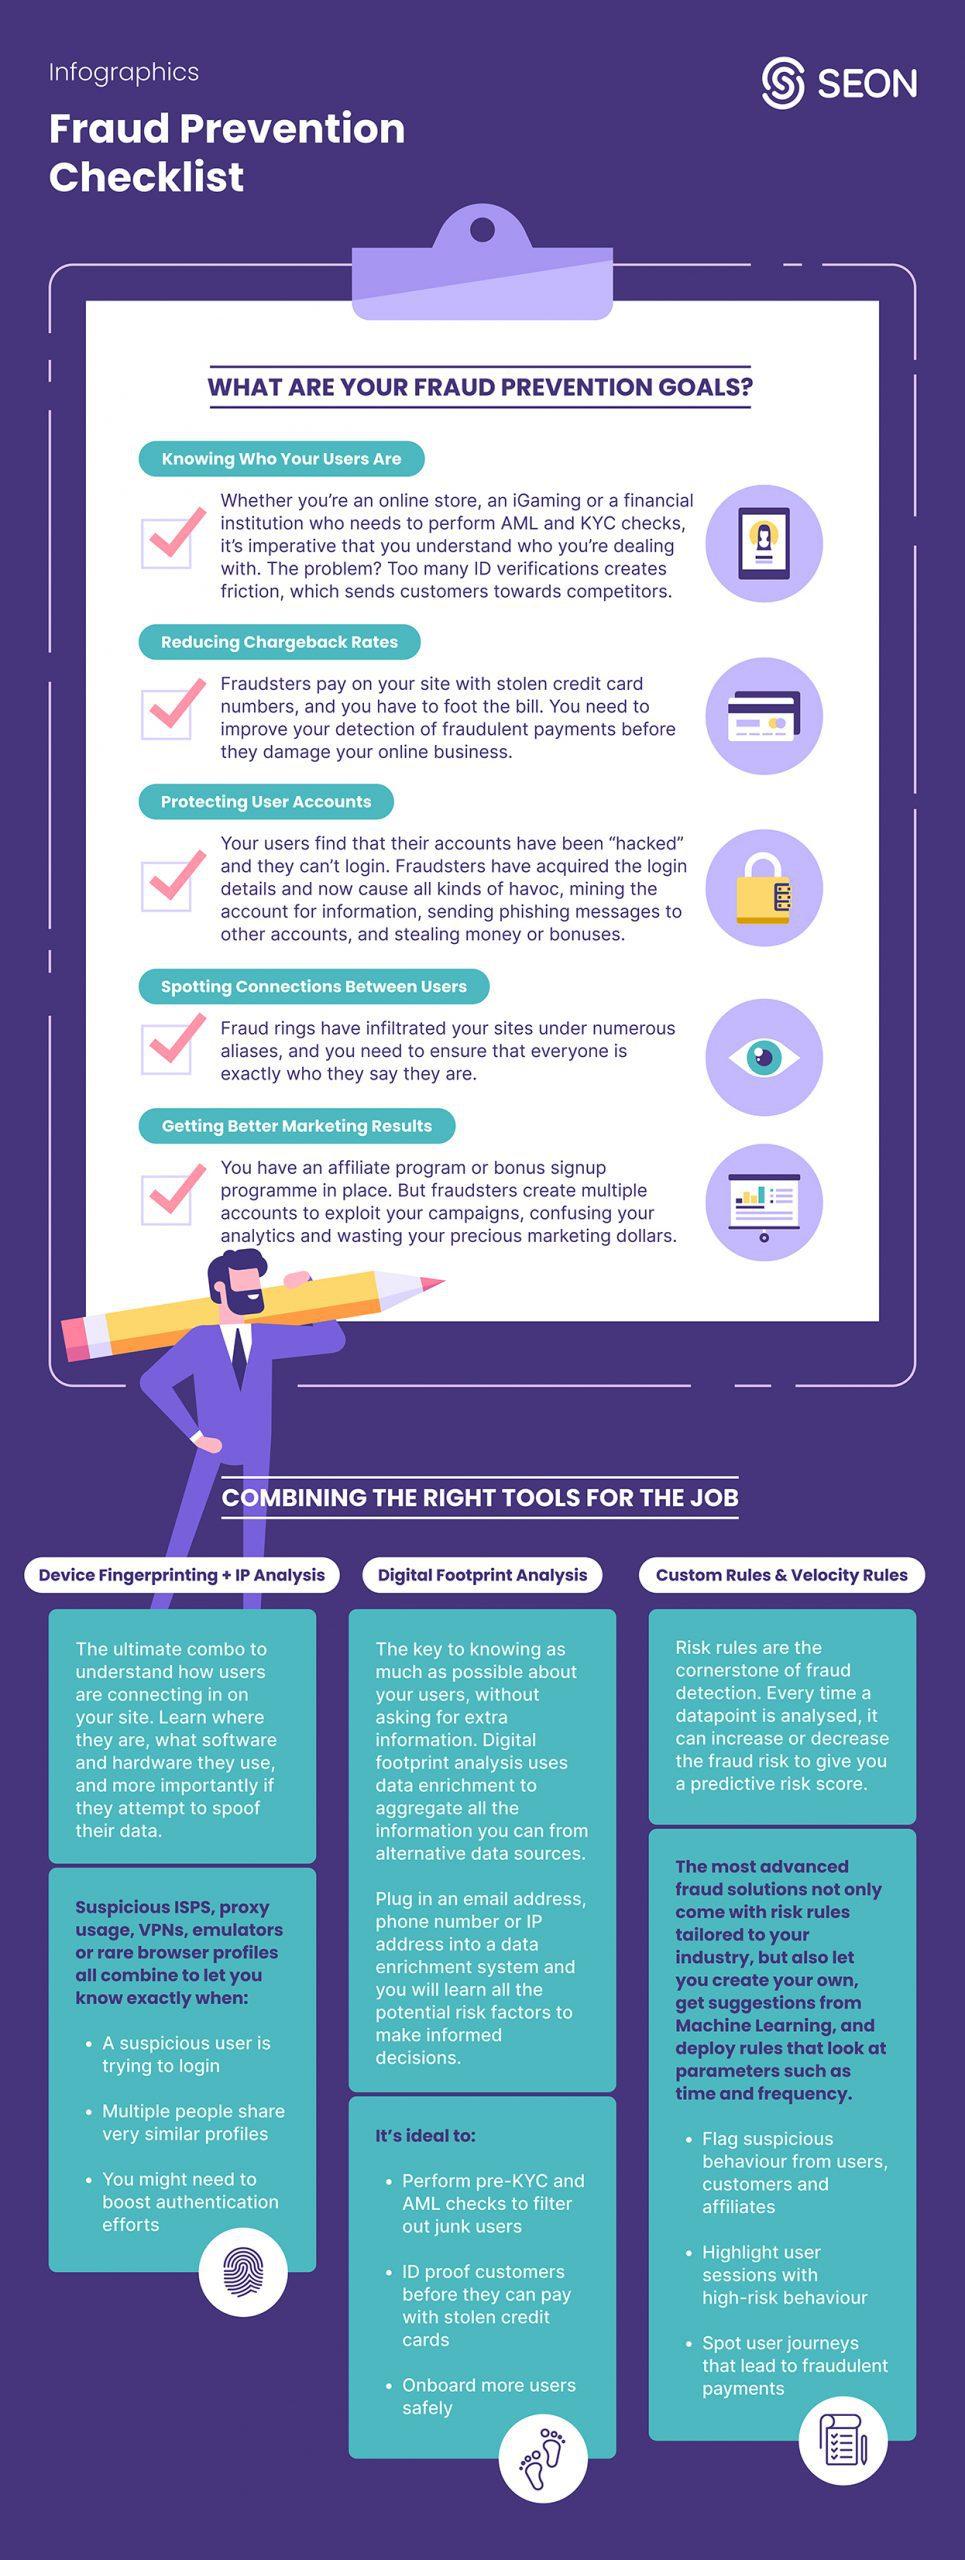 SEON Infographics - Fraud Prevention Checklist